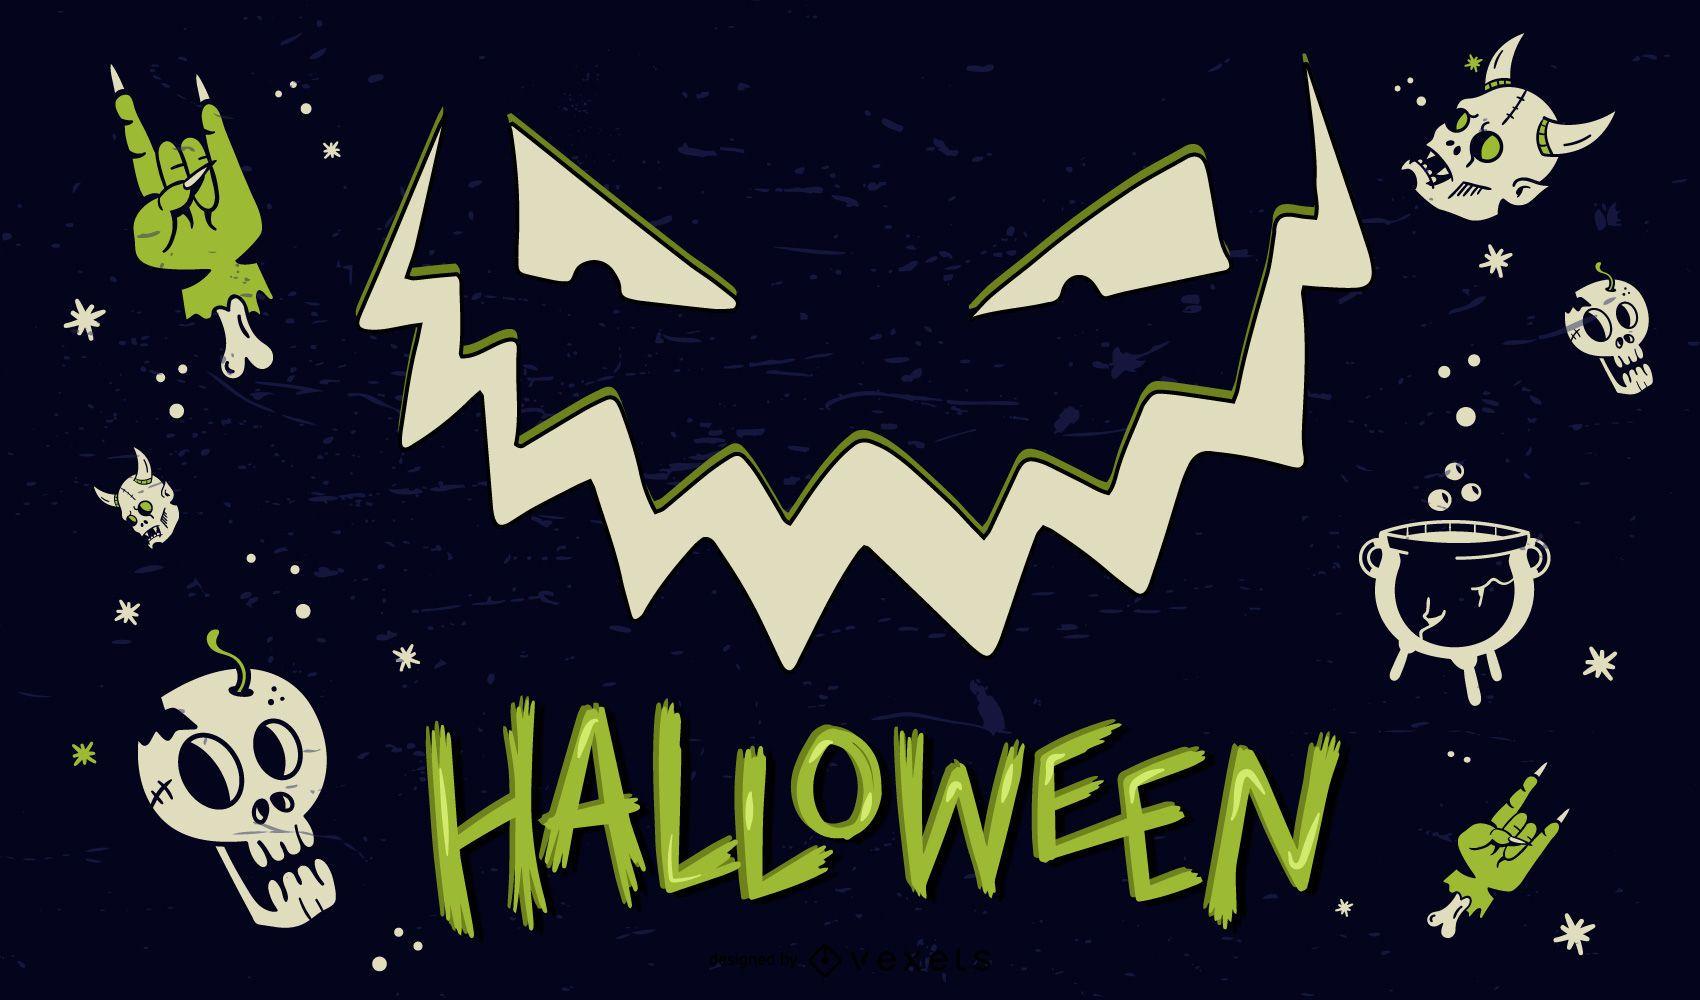 Halloween Design Elements Poster